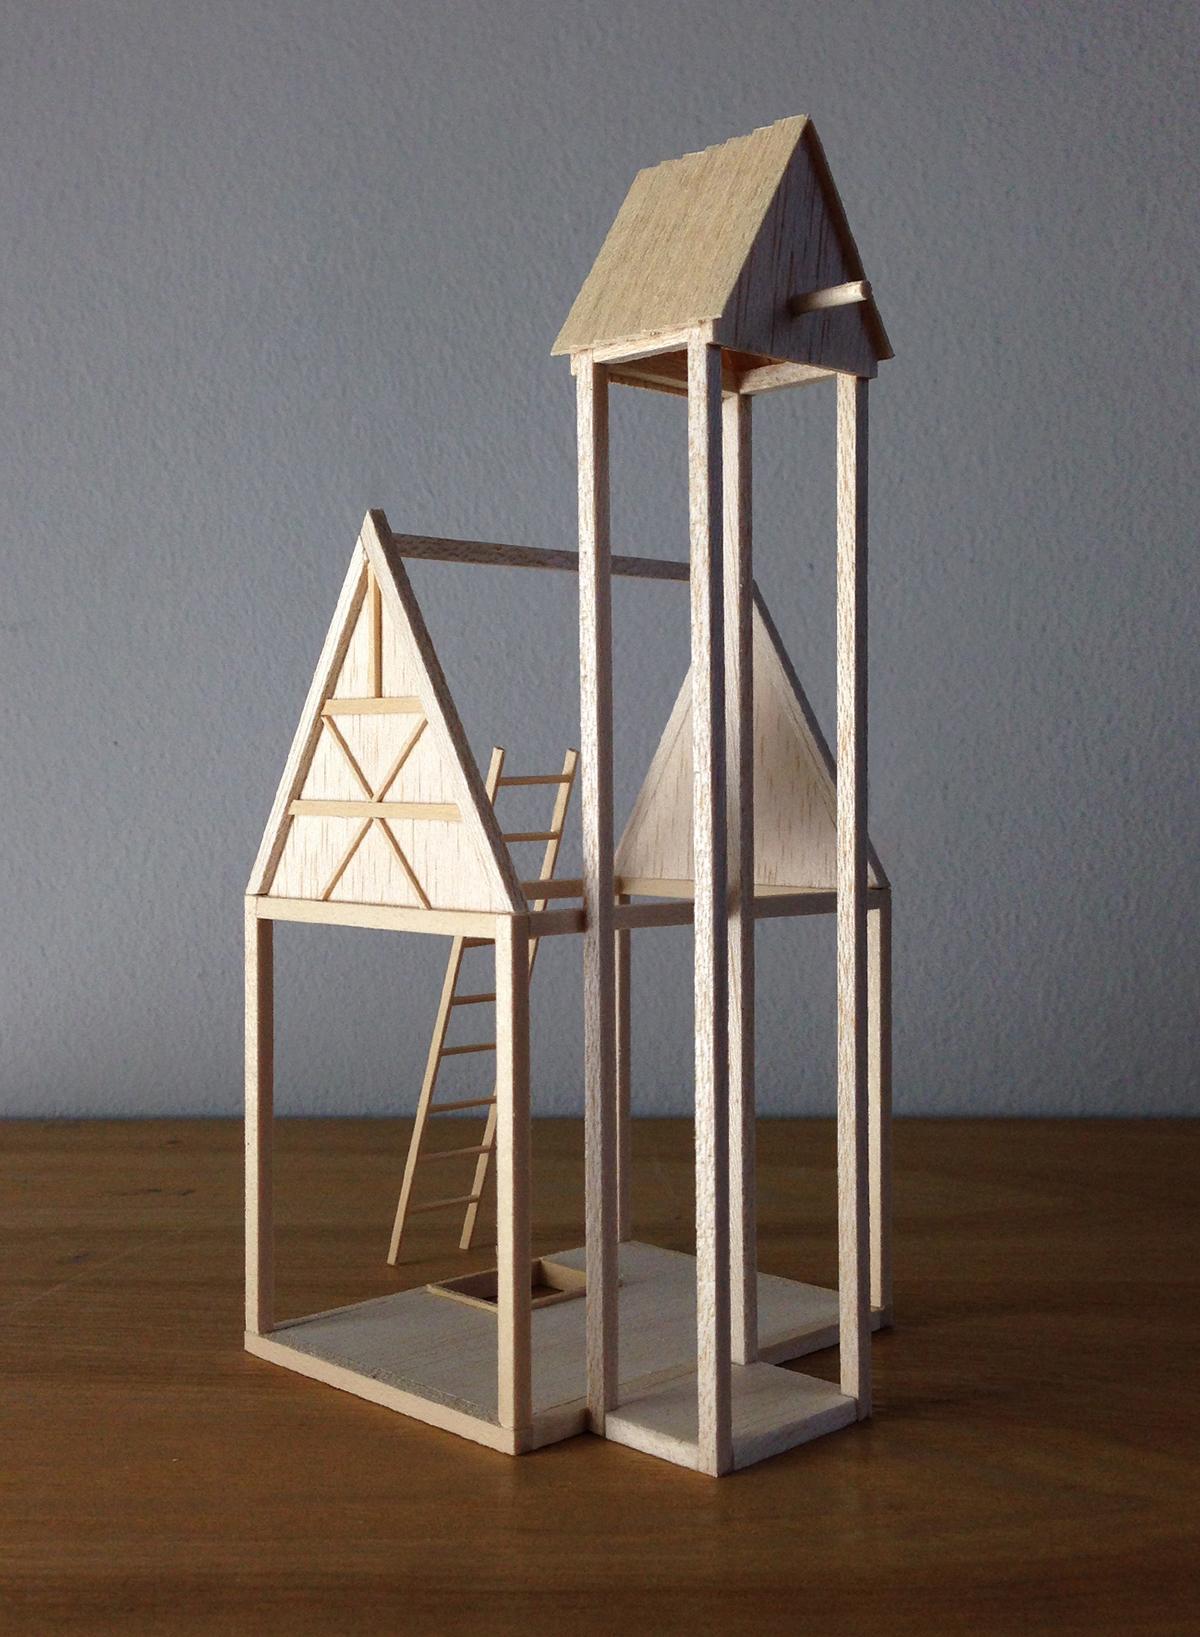 Balsa wood Miniature craft sculpture model architecture houses maquette